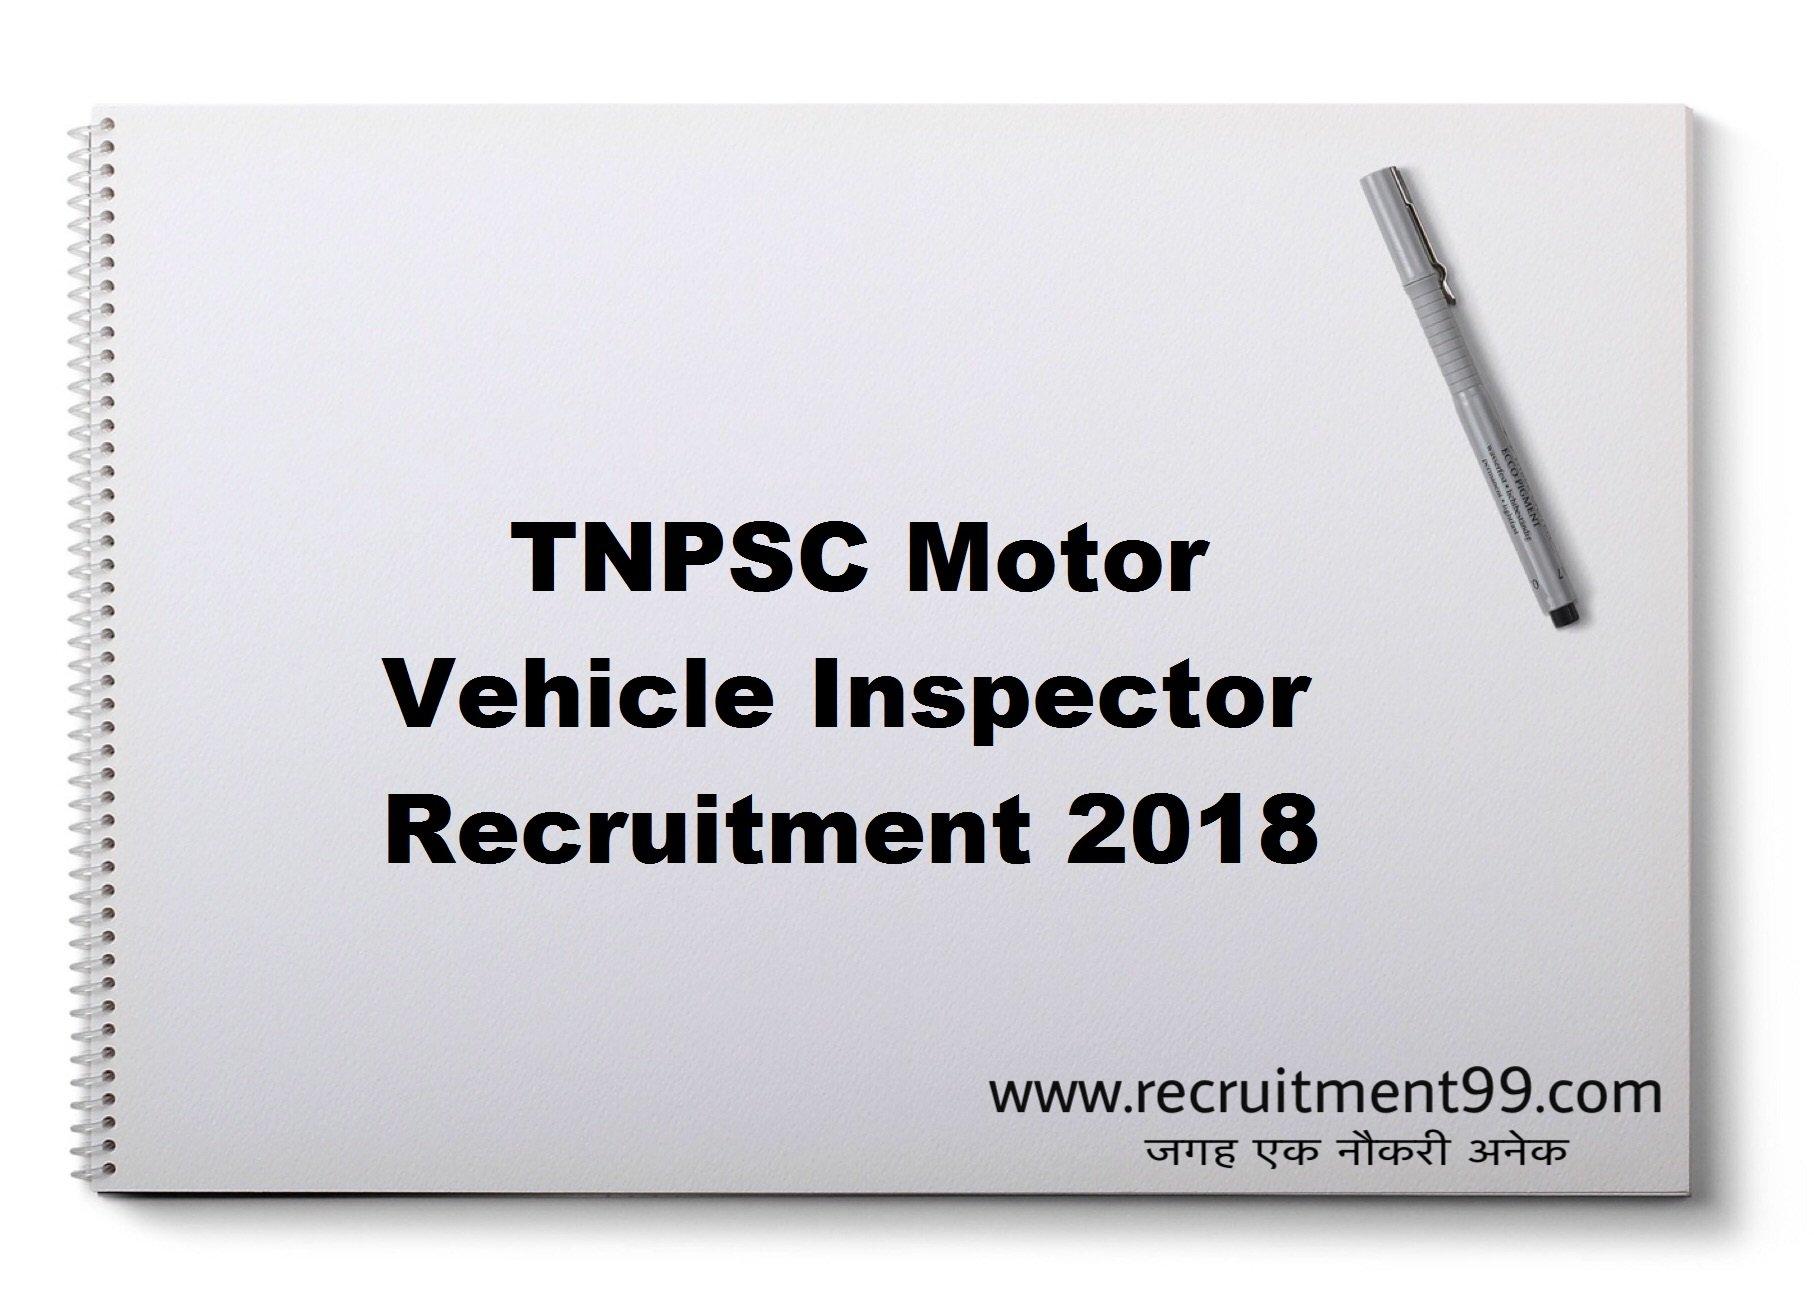 TNPSC Motor Vehicle Inspector Recruitment Hall Ticket Result 2018